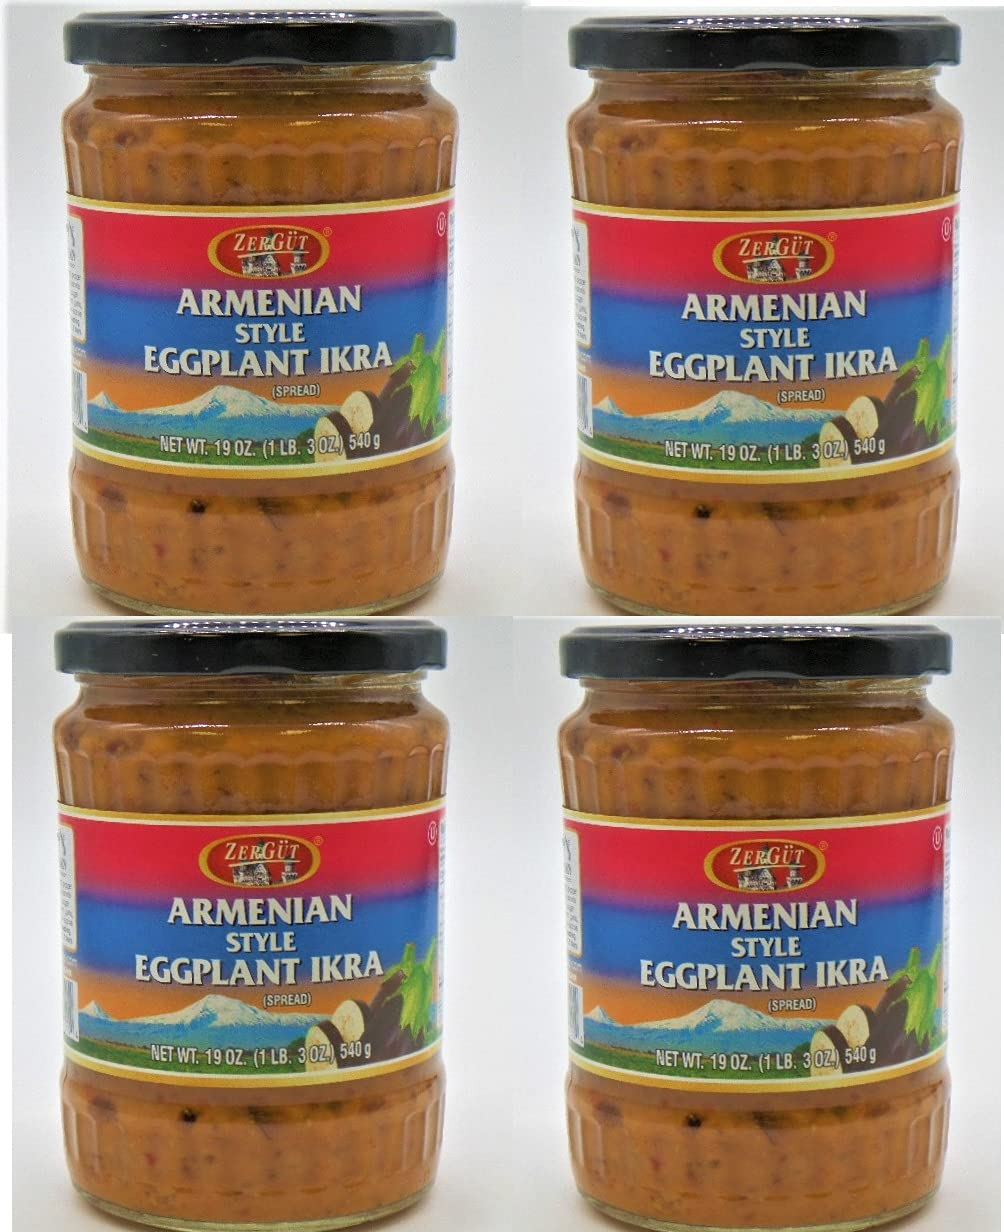 ZerGut Omaha Mall Armenian Max 77% OFF Style Eggplant Ikra Kosher Jars 540 4 Glass 19OZ